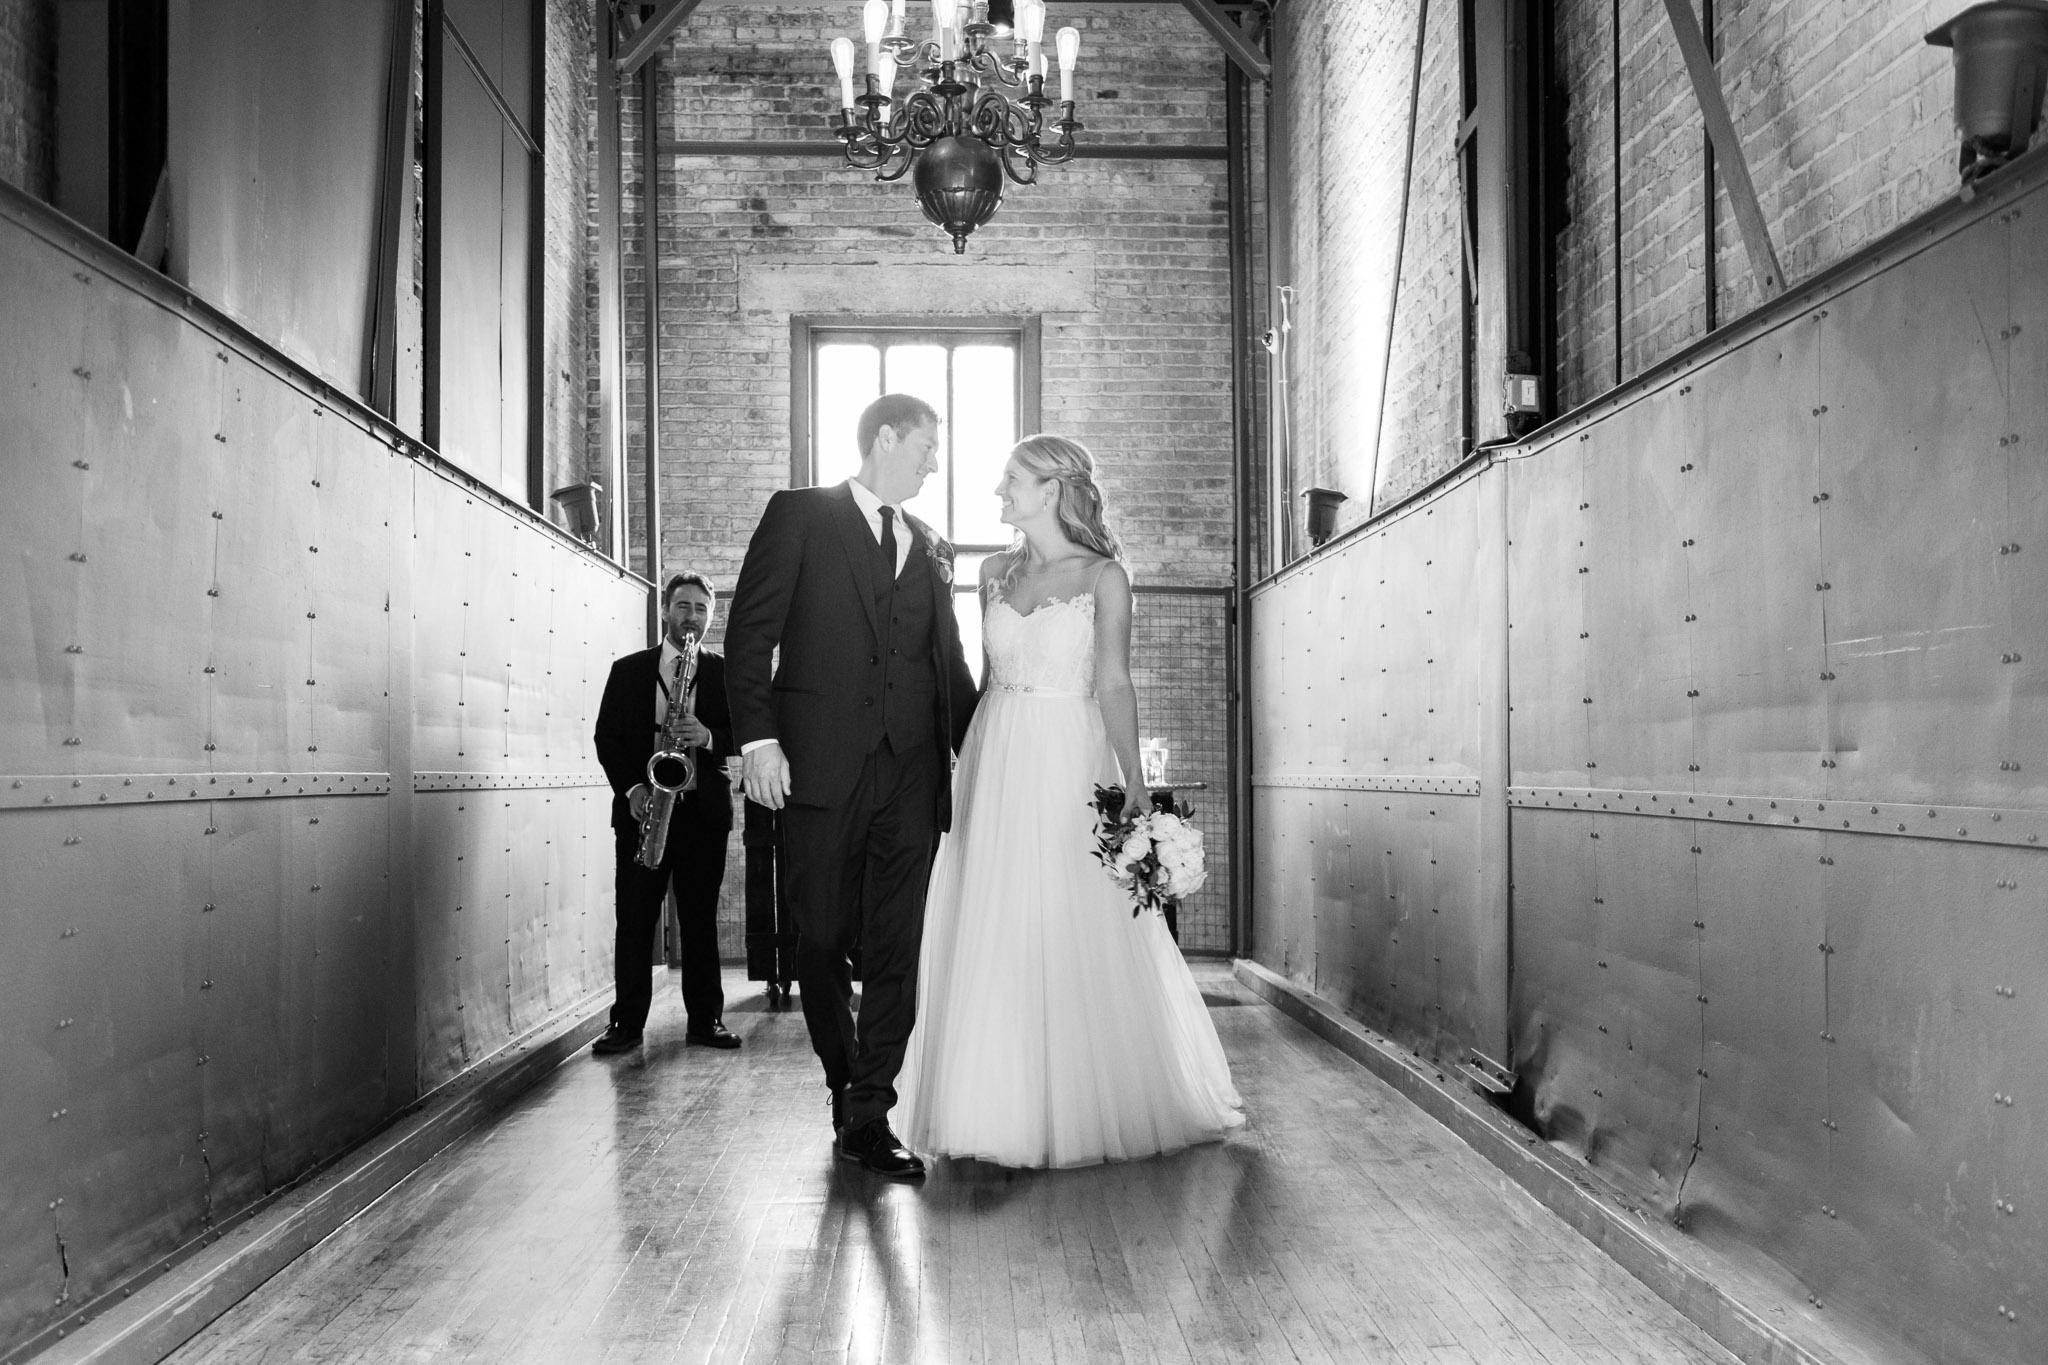 bridgeport-art-center-wedding-photos-19.jpg